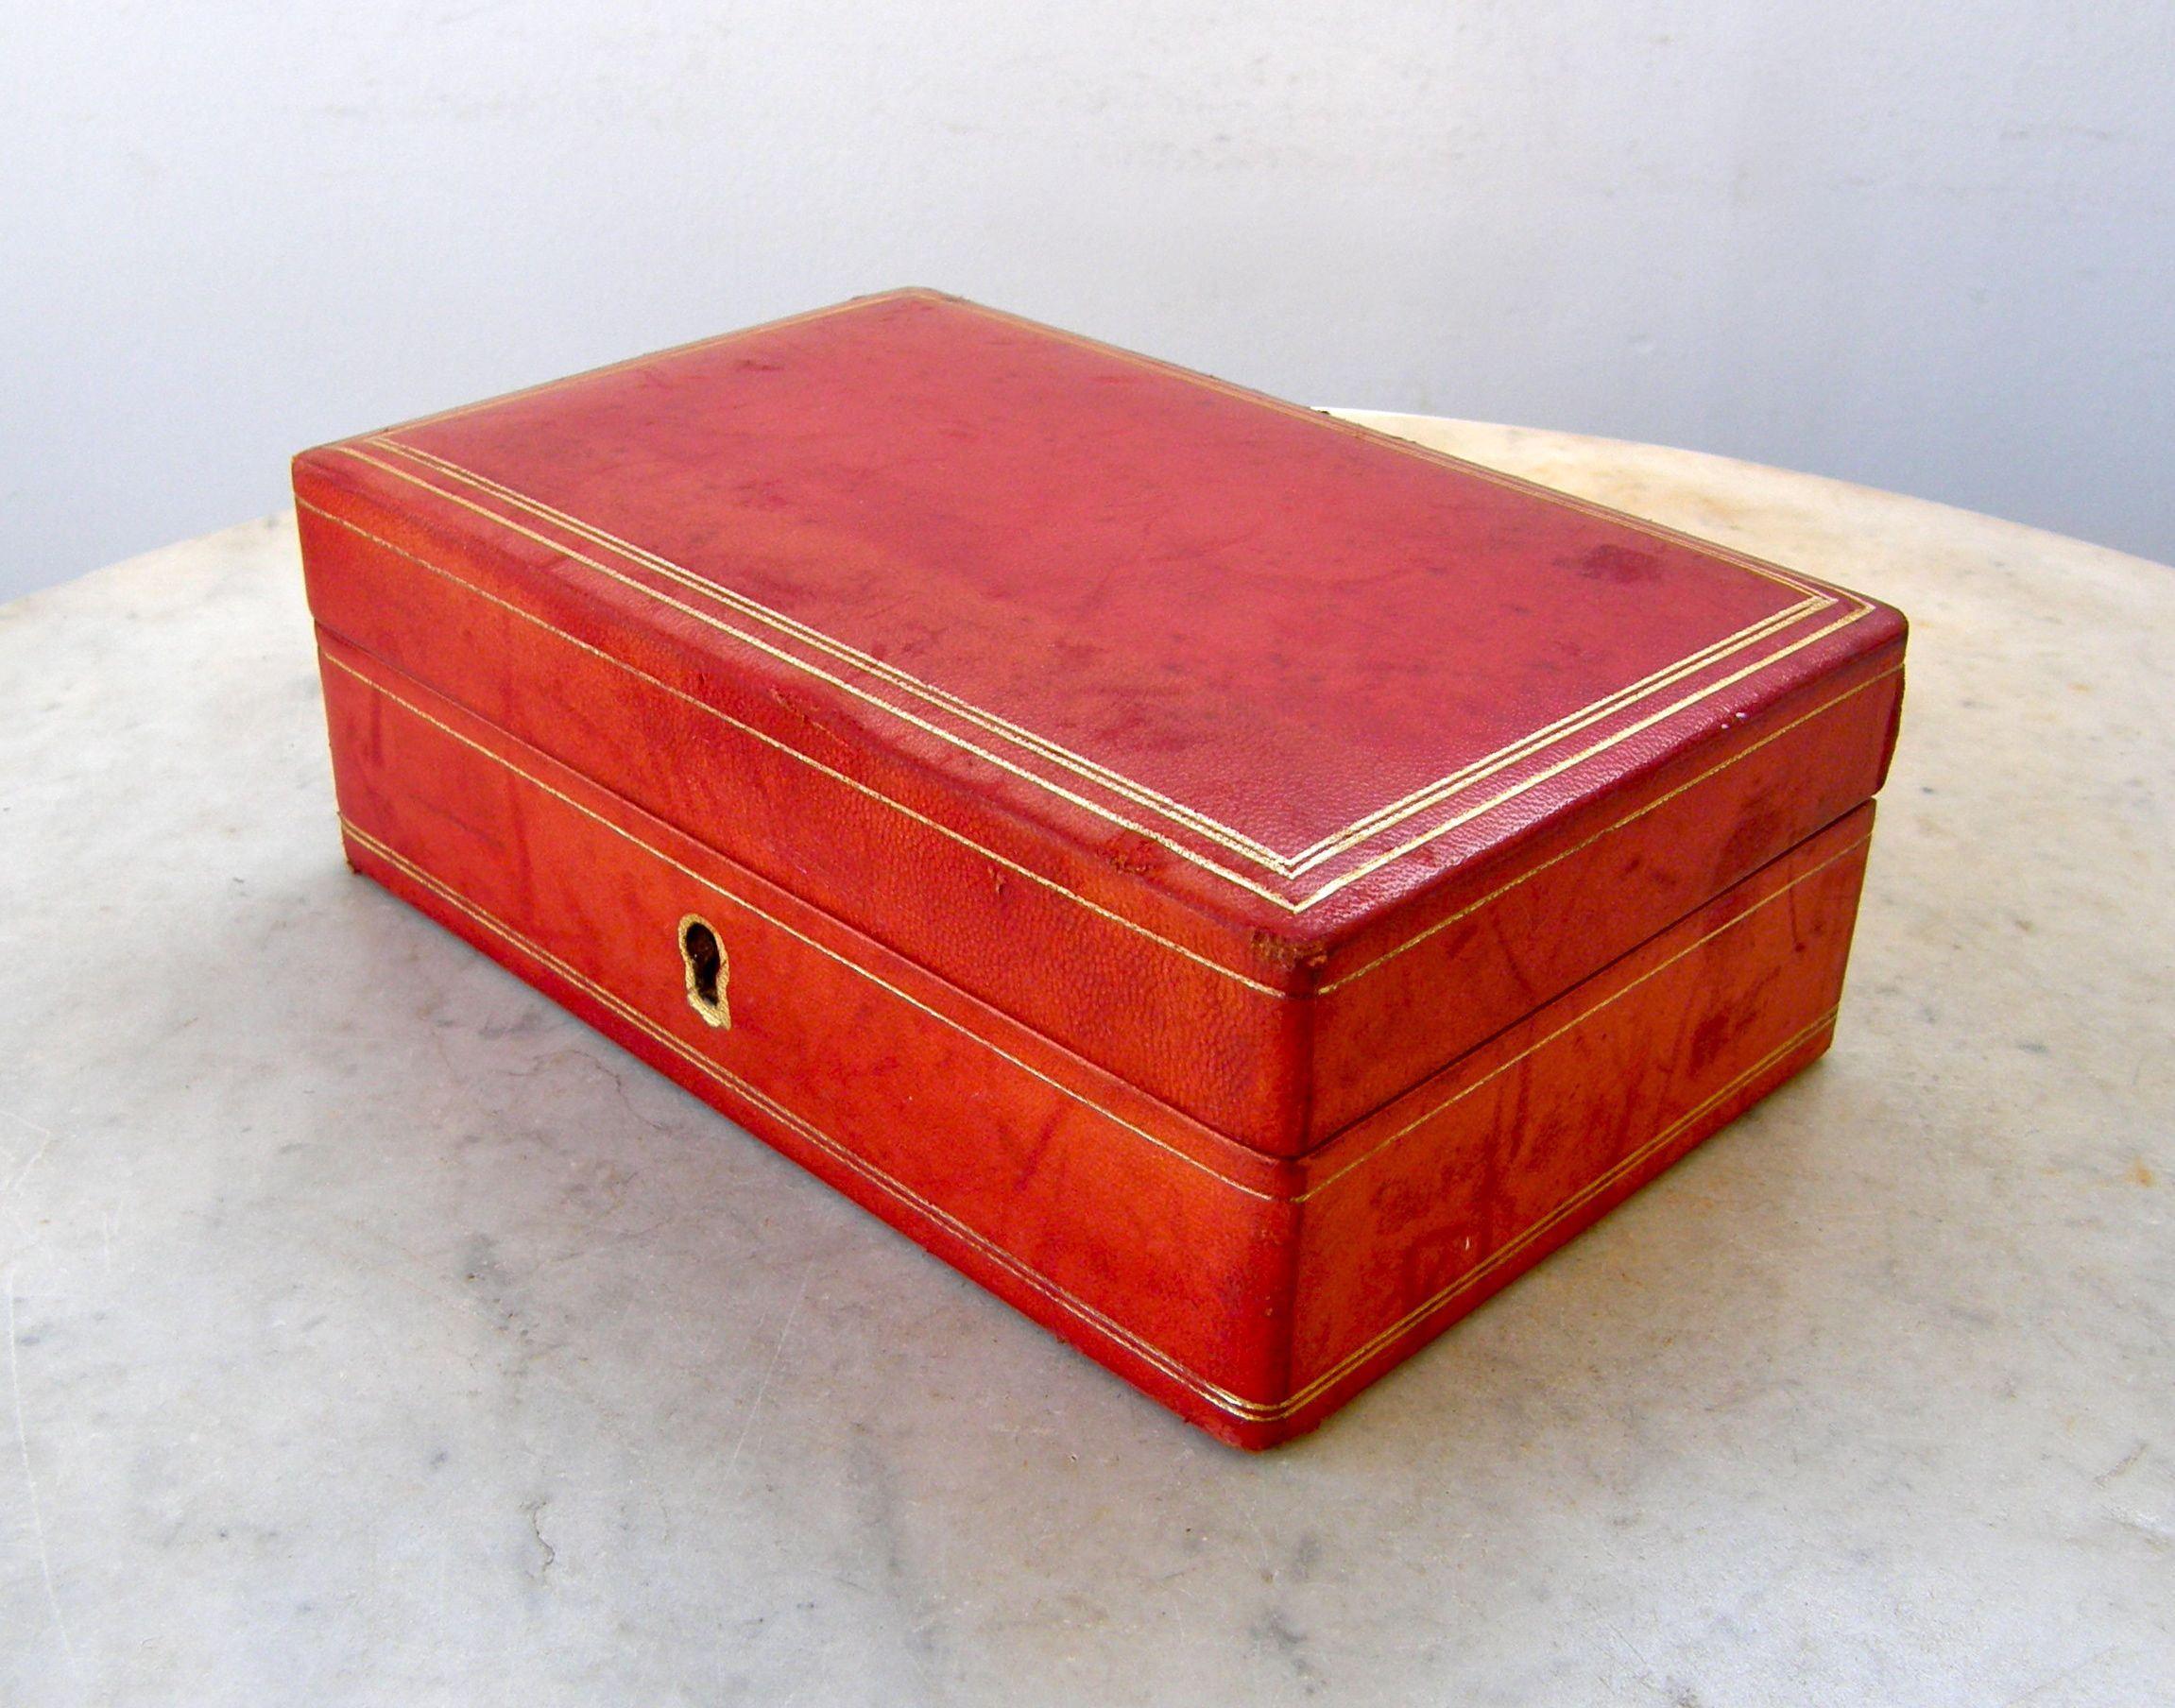 Leather Jewelry Box Trinket Case Red Gold Striped Border Red Velvet Interior Ring Holder Satin Bottom Brass H Leather Jewelry Box Velvet Interiors Gold Stripes